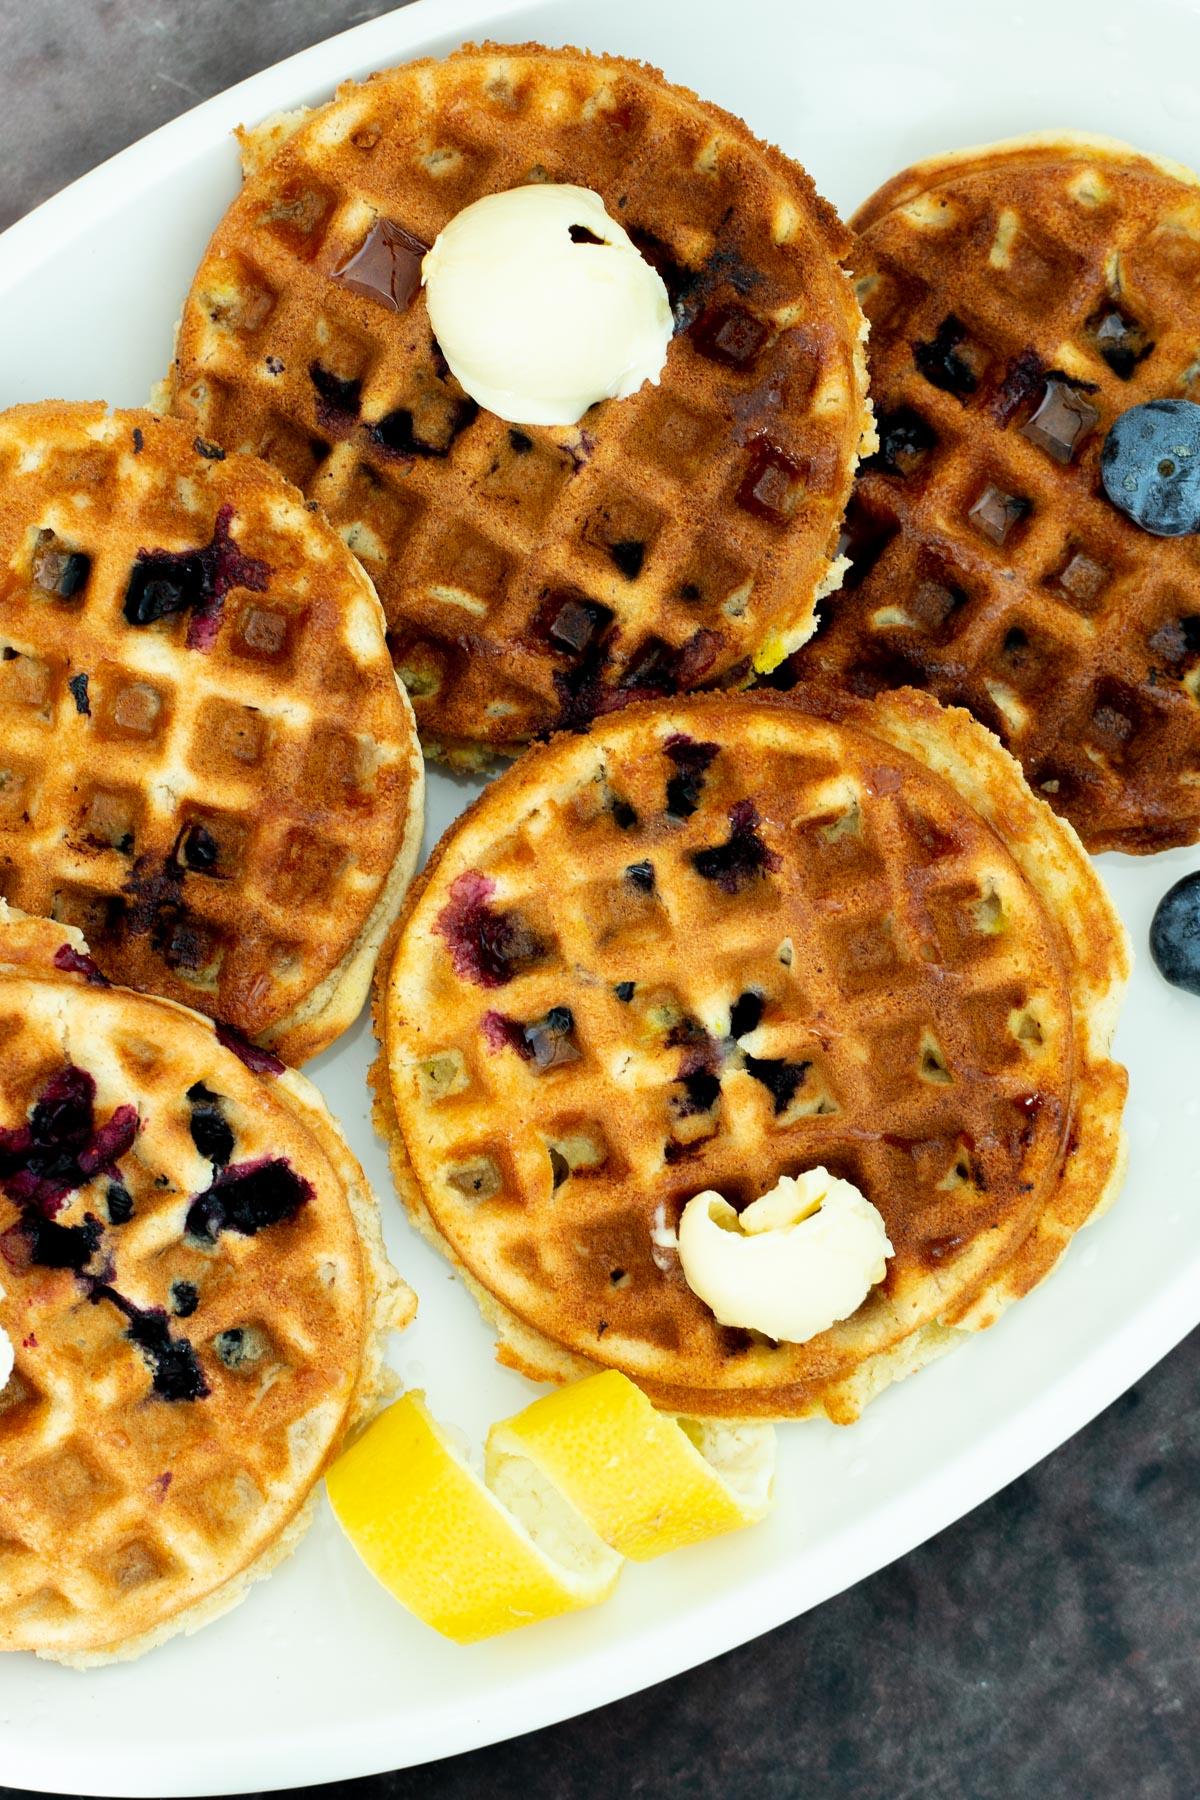 vegan glutenfree Lemon Blueberry Waffles on a platter served with dollops of butter